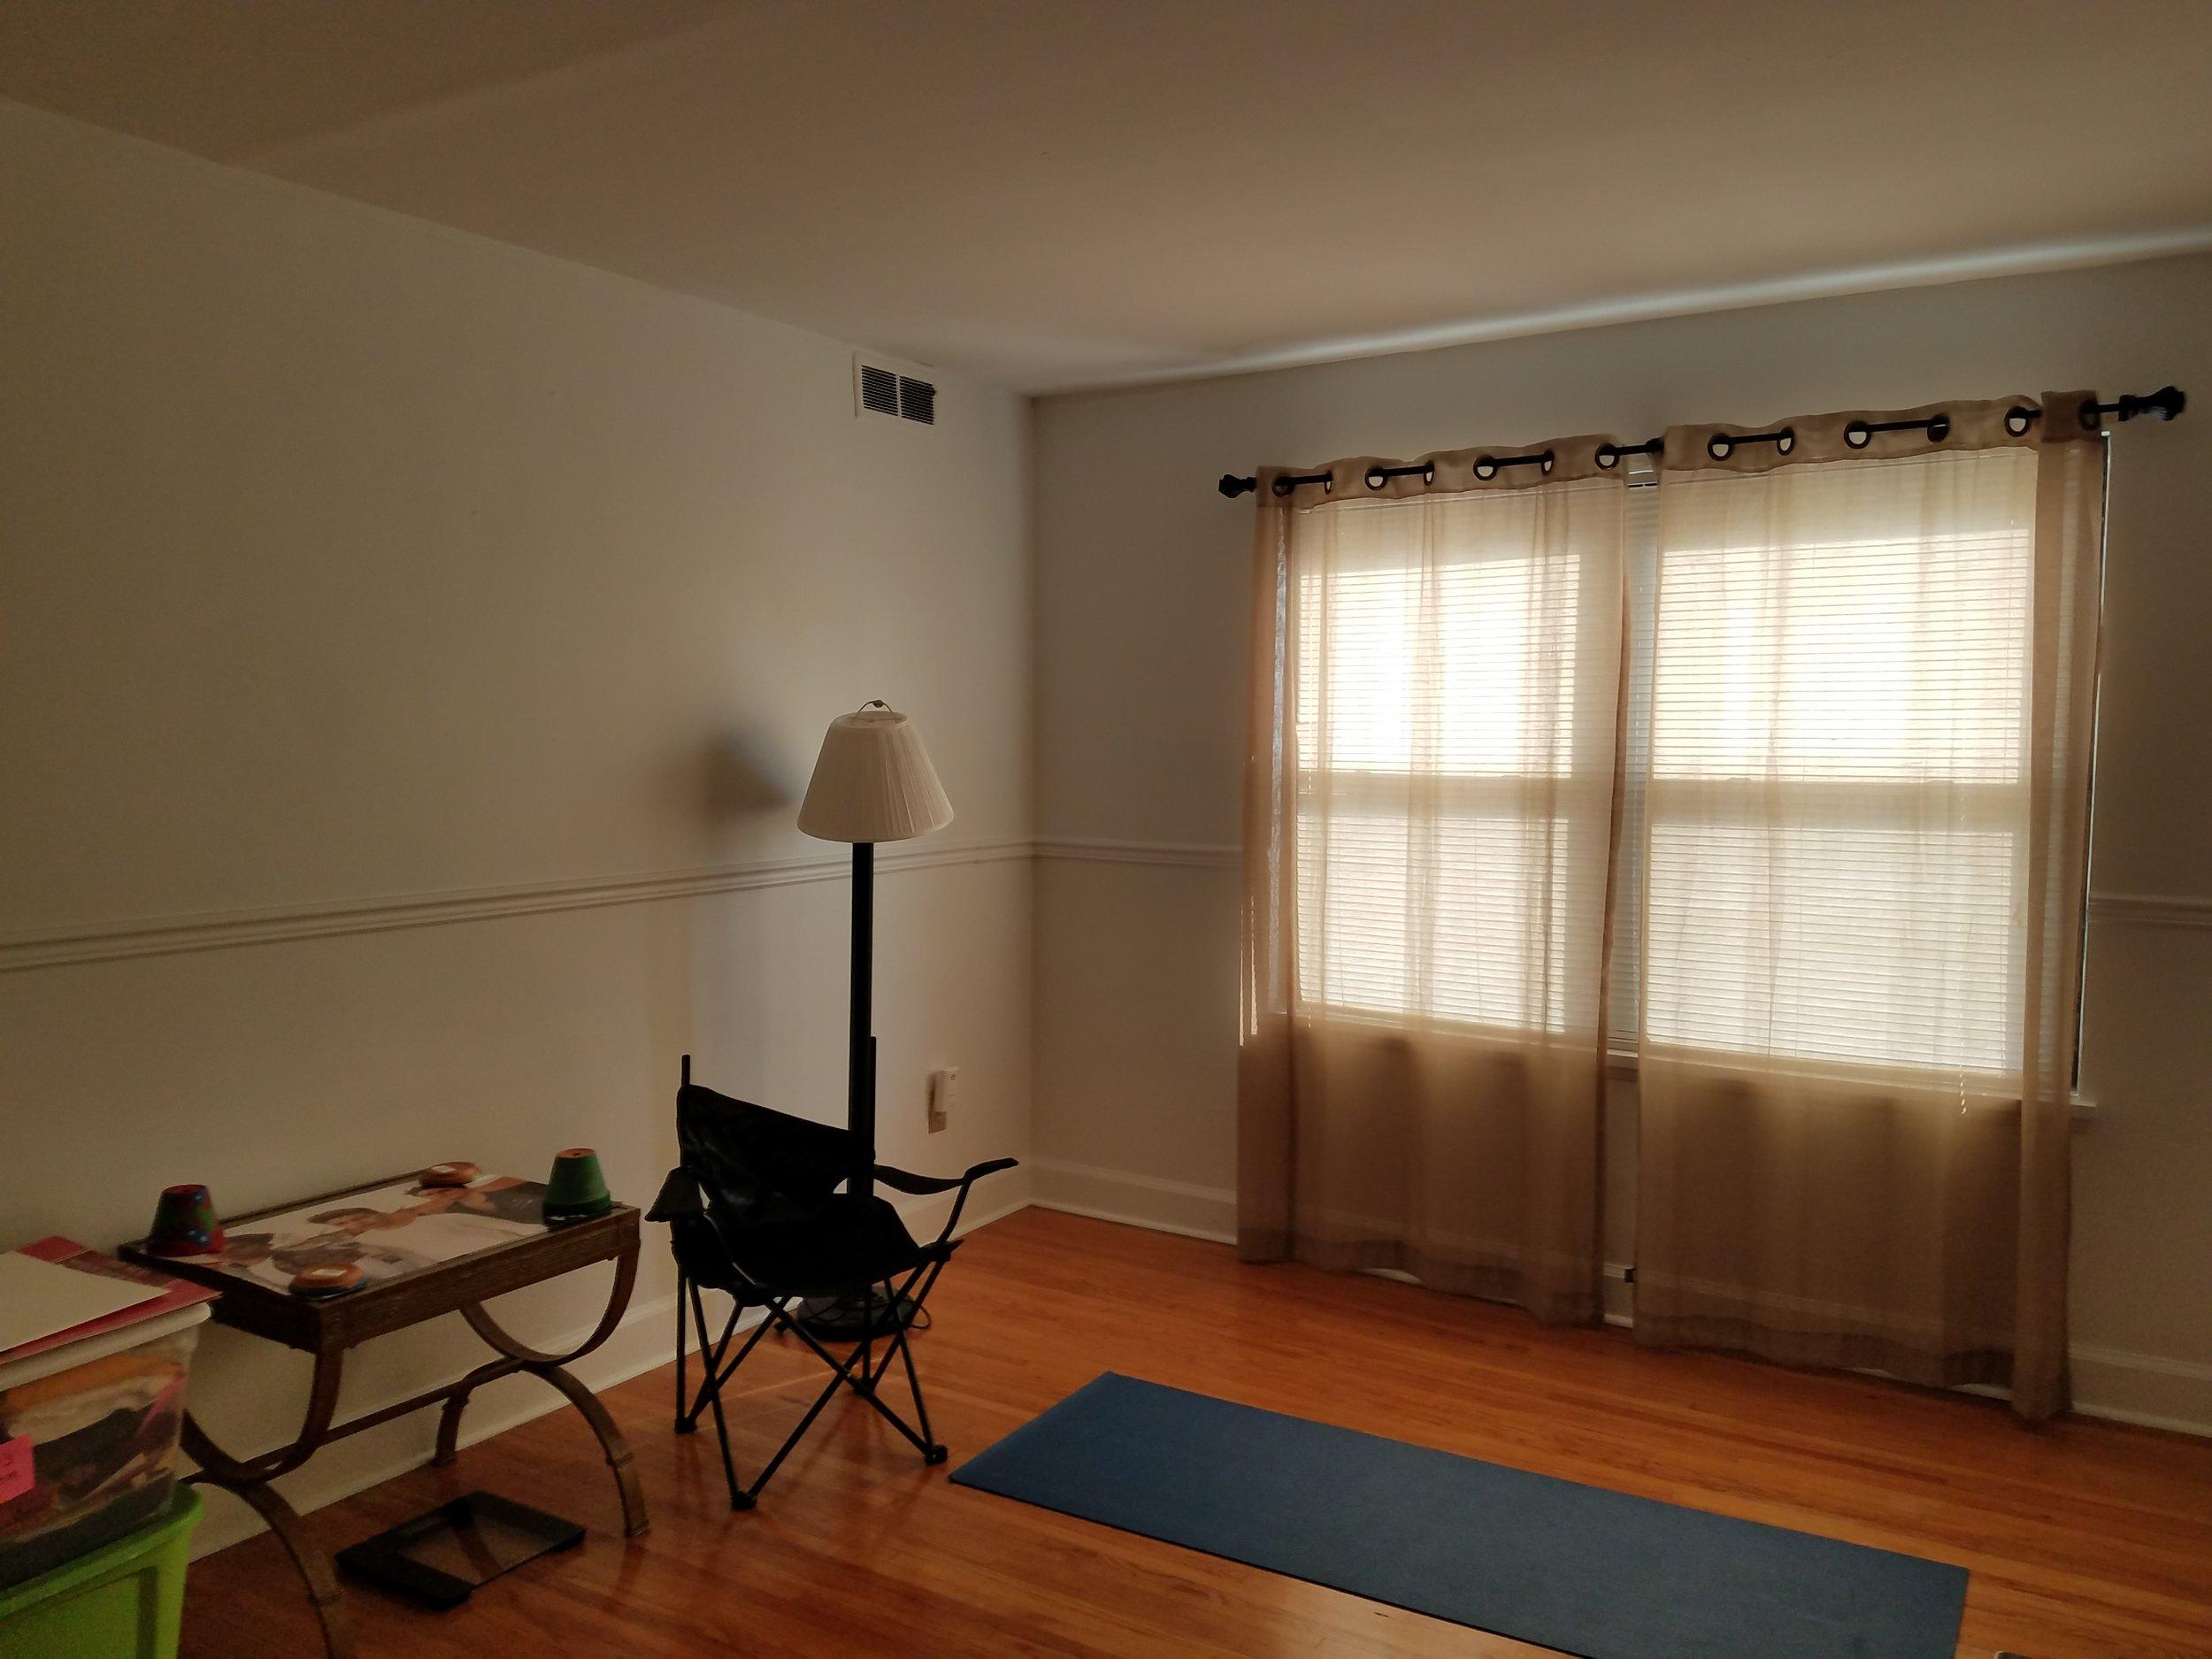 livingroom before 3.jpg